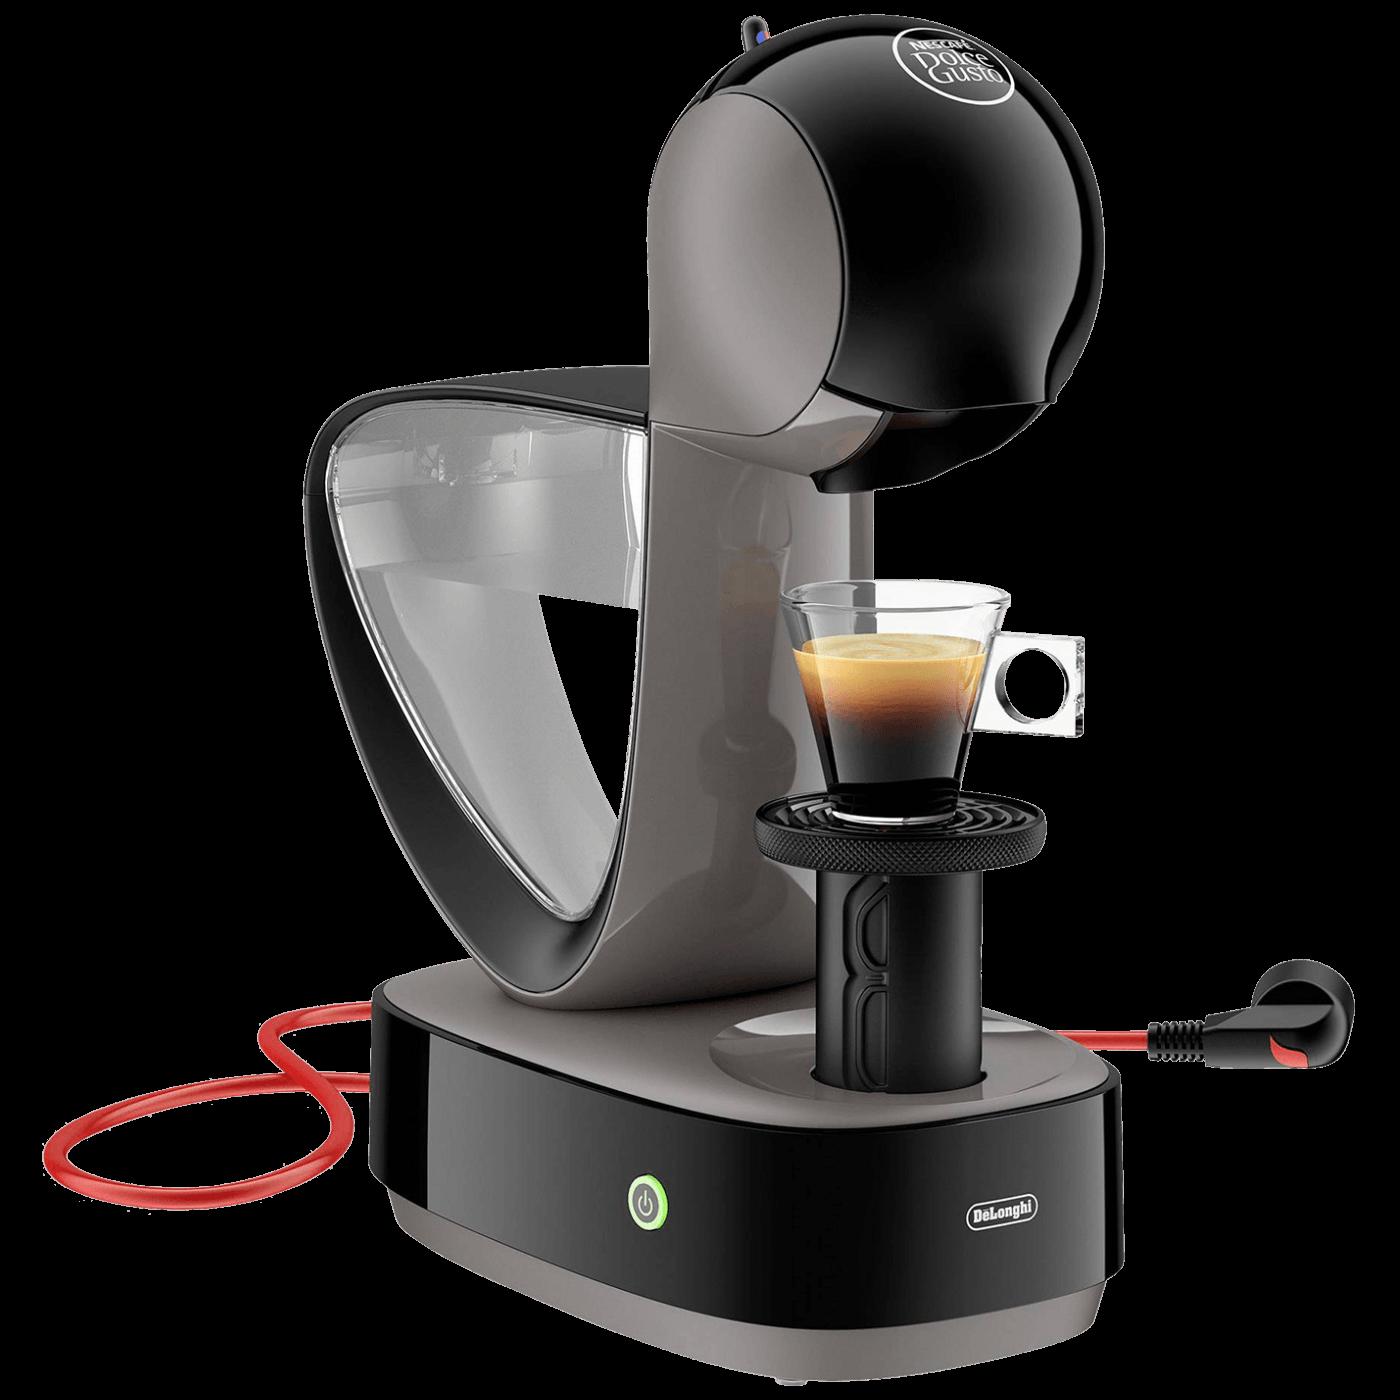 Aparat za kafu, DeLonghi / Krups, Dolce Gusto Infinisima